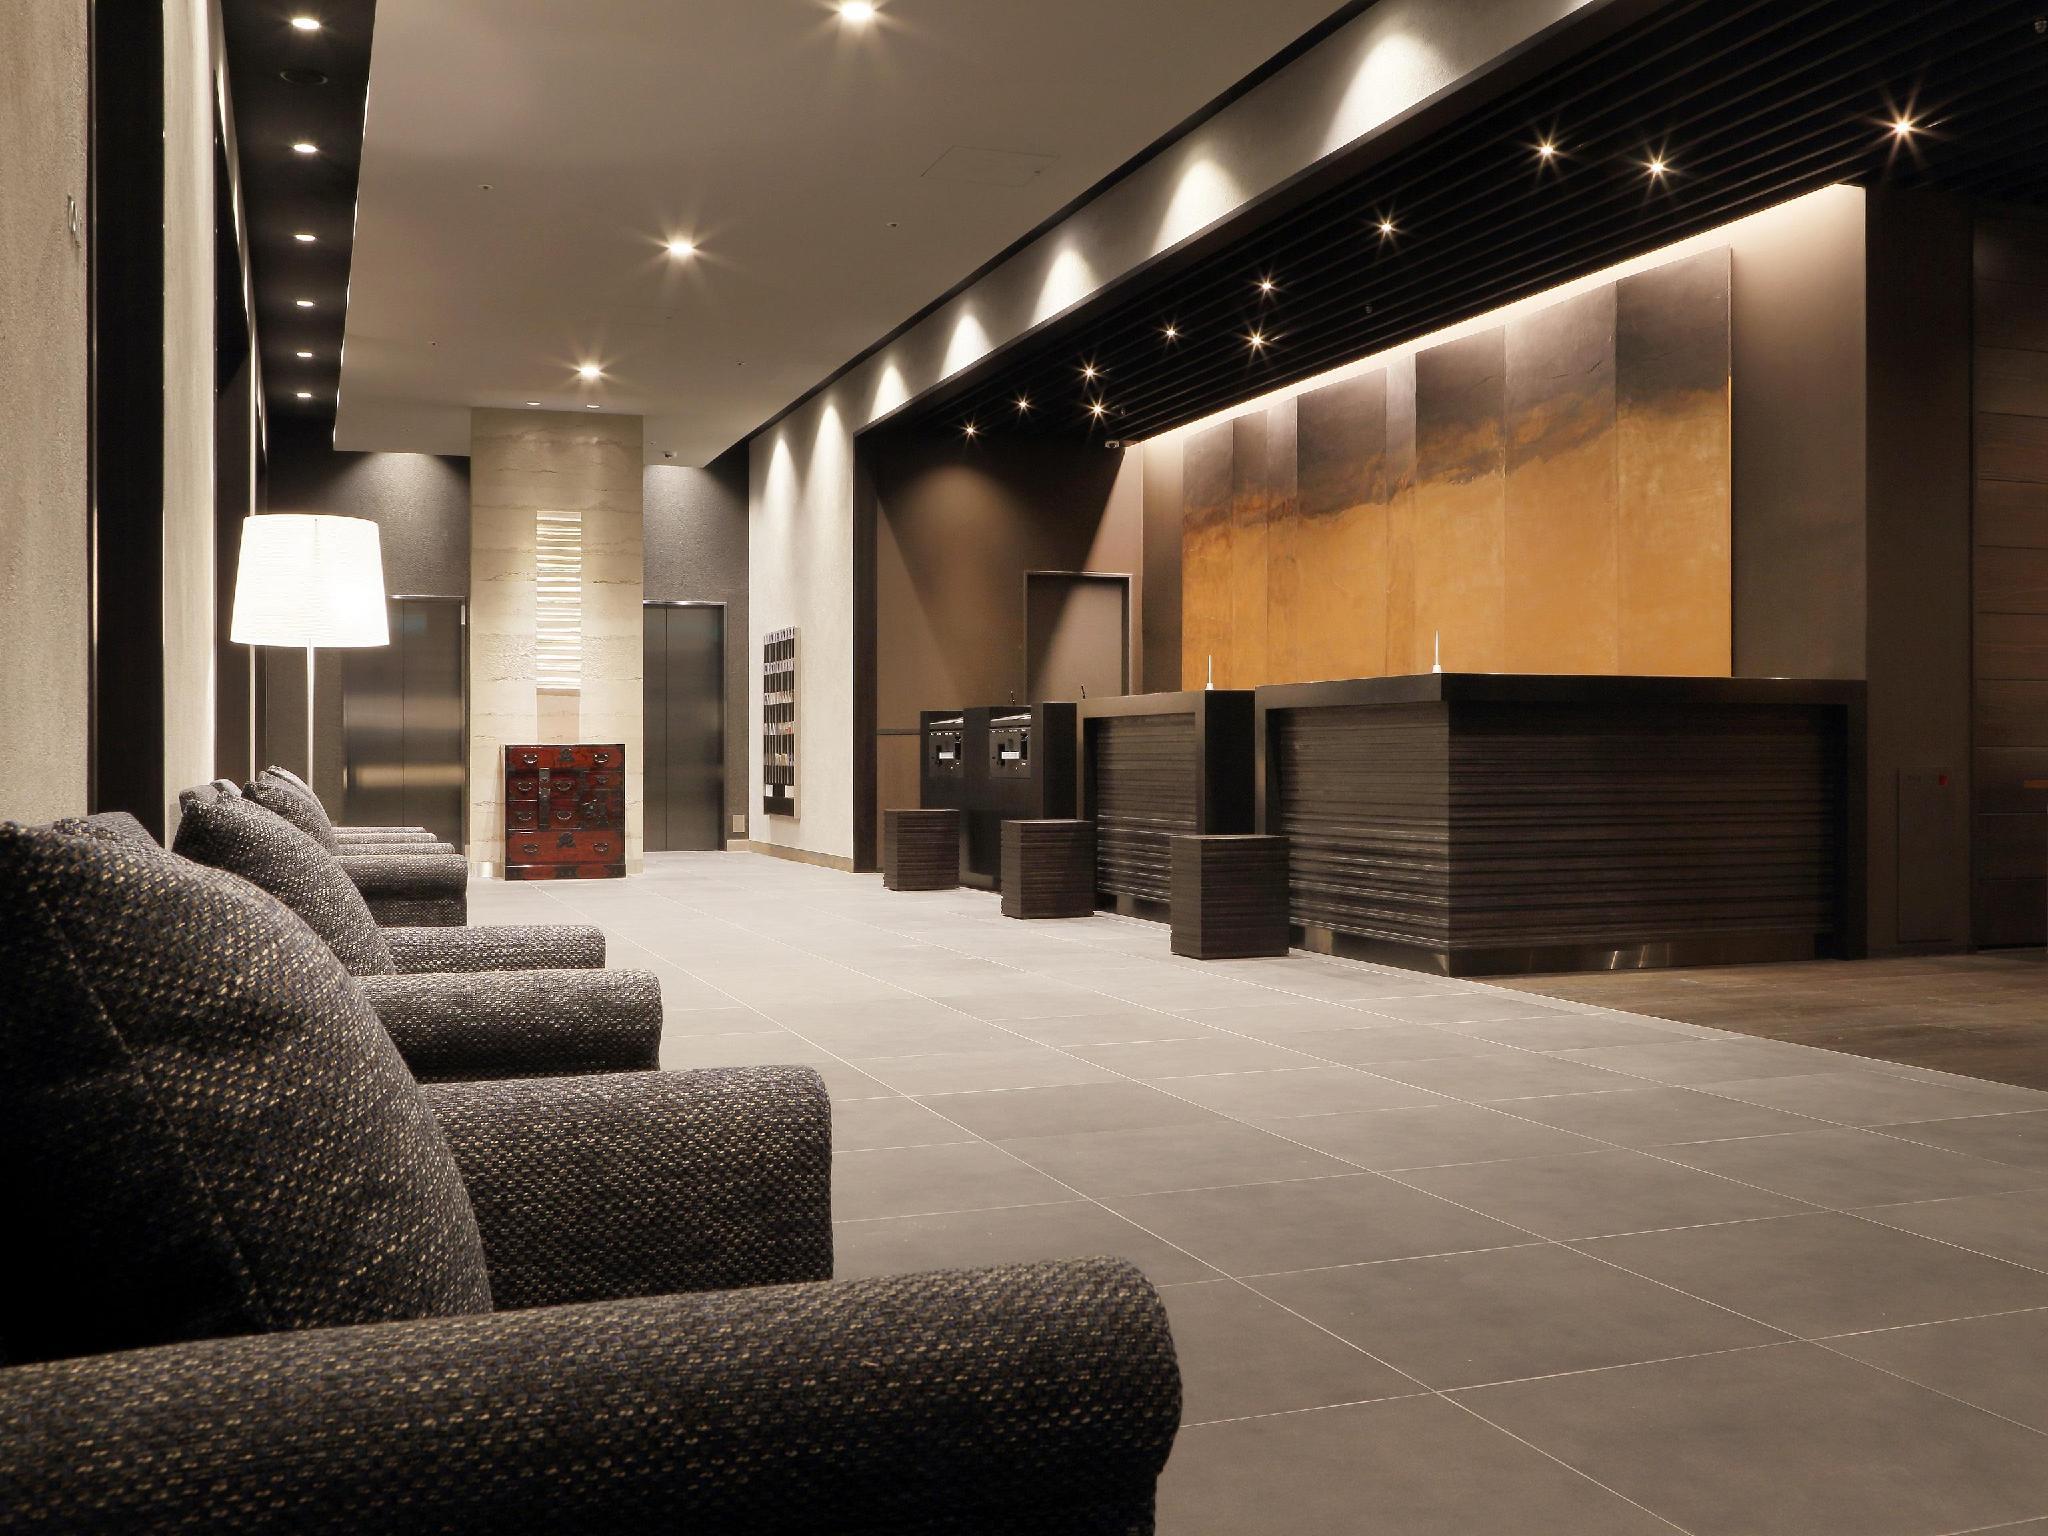 仙臺仙臺華盛頓飯店 (Sendai Washington Hotel)線上訂房|Agoda.com